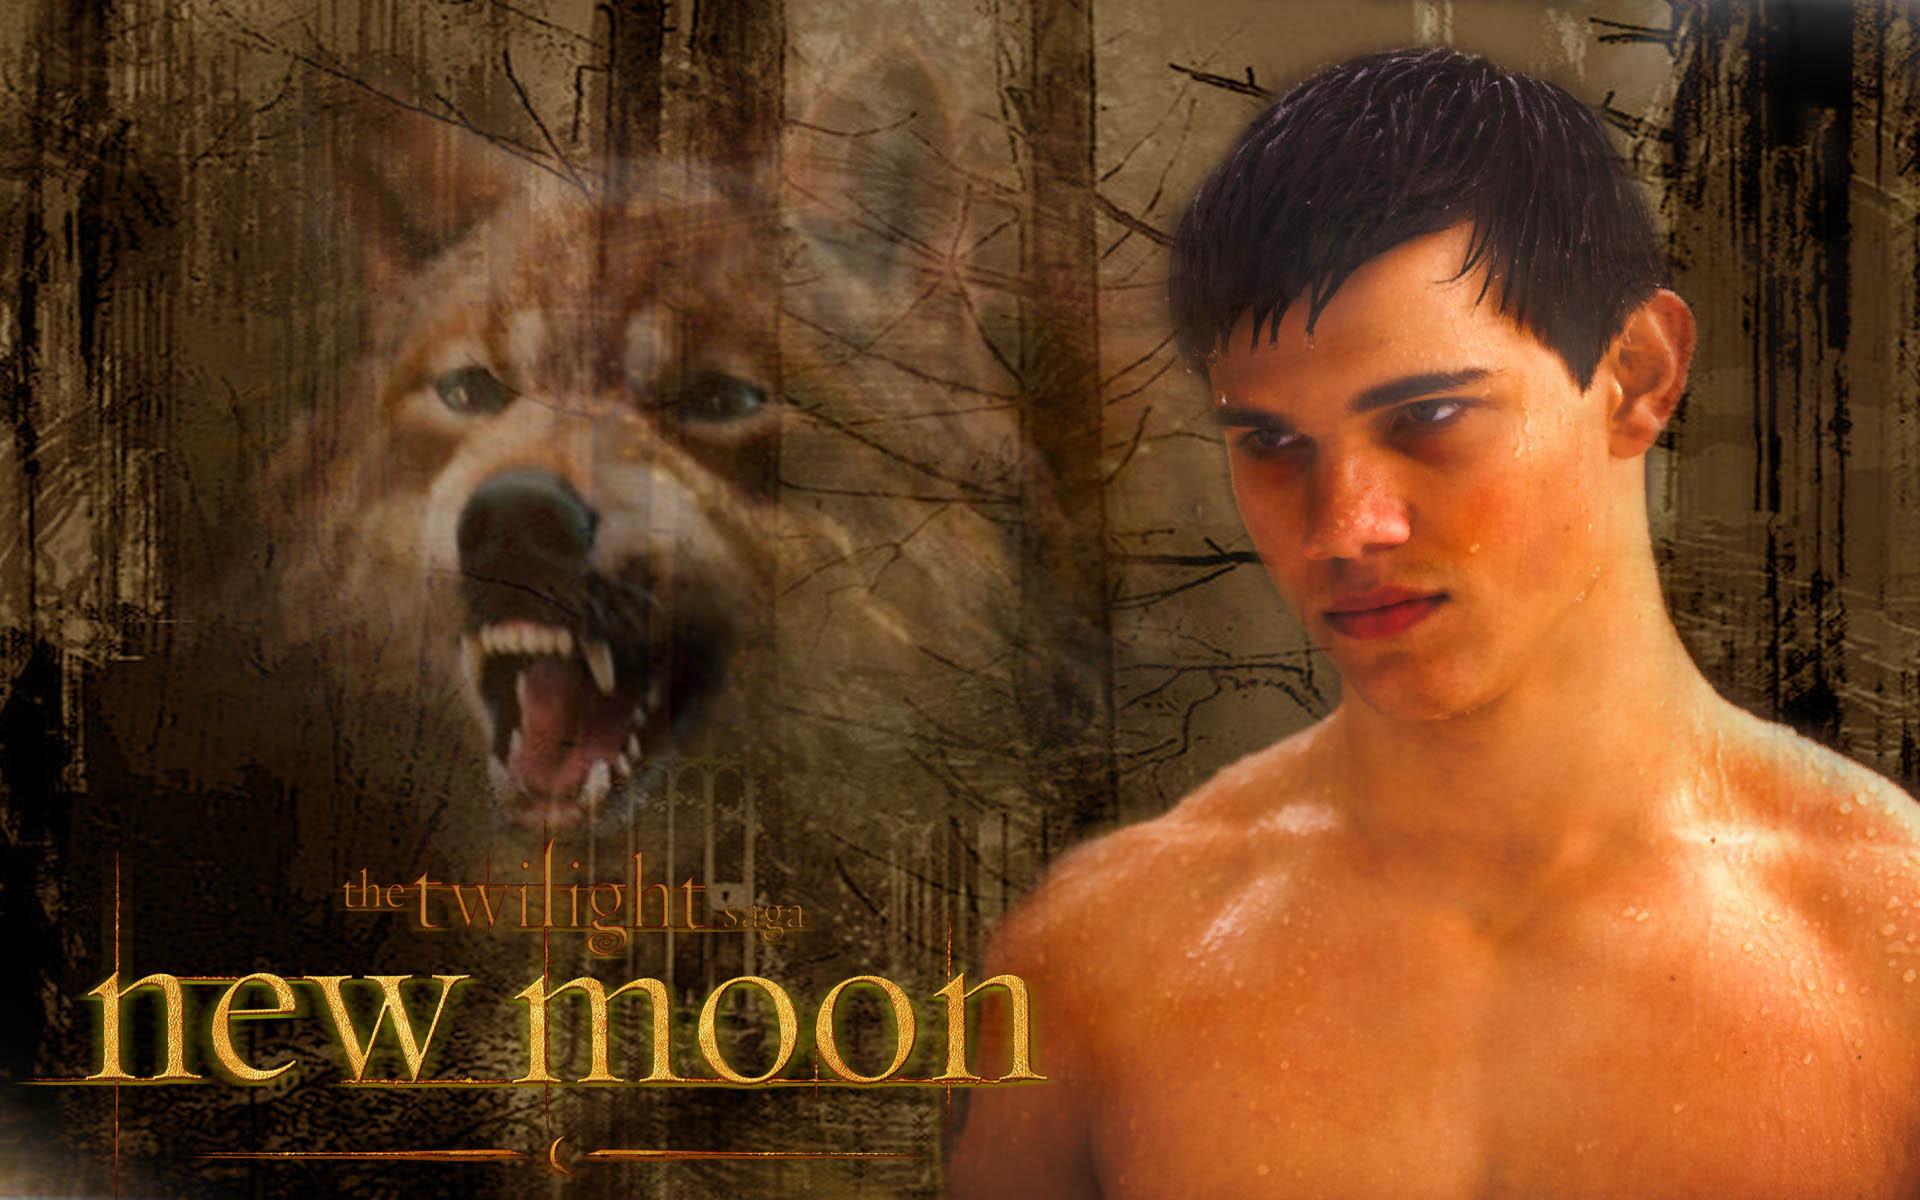 jacob Blac New Moon – Jacob Black Wallpaper (7270404) – Fanpop